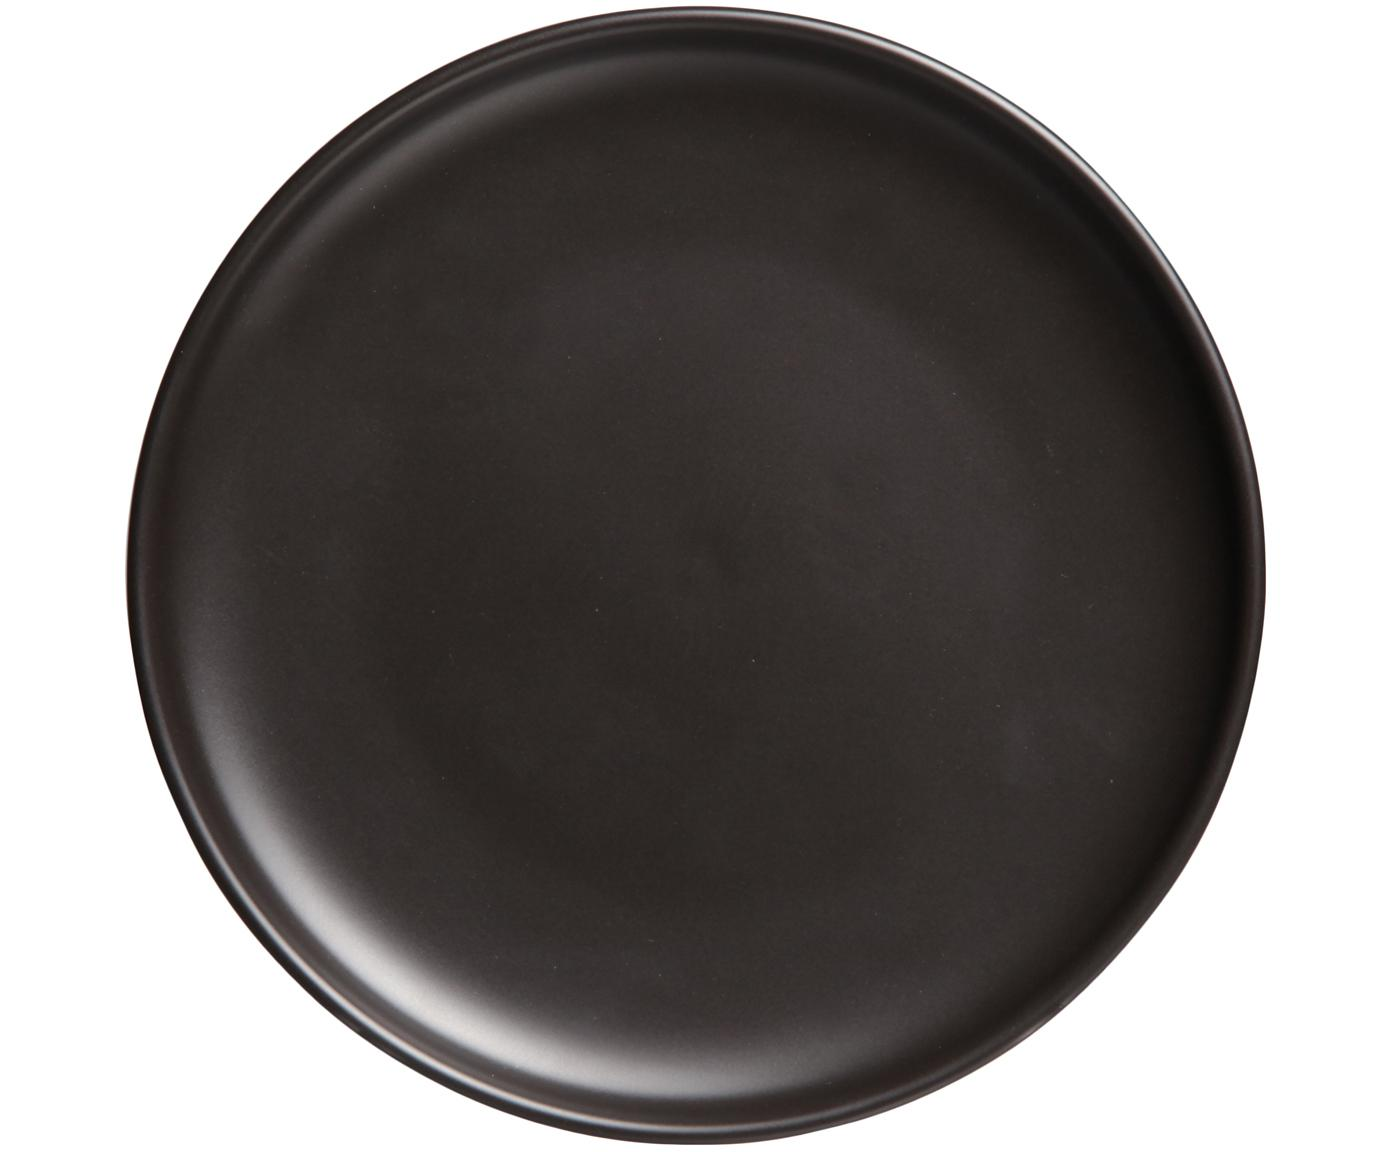 Platos postre Okinawa, 6uds., Cerámica, Negro, mate, Ø 20 cm